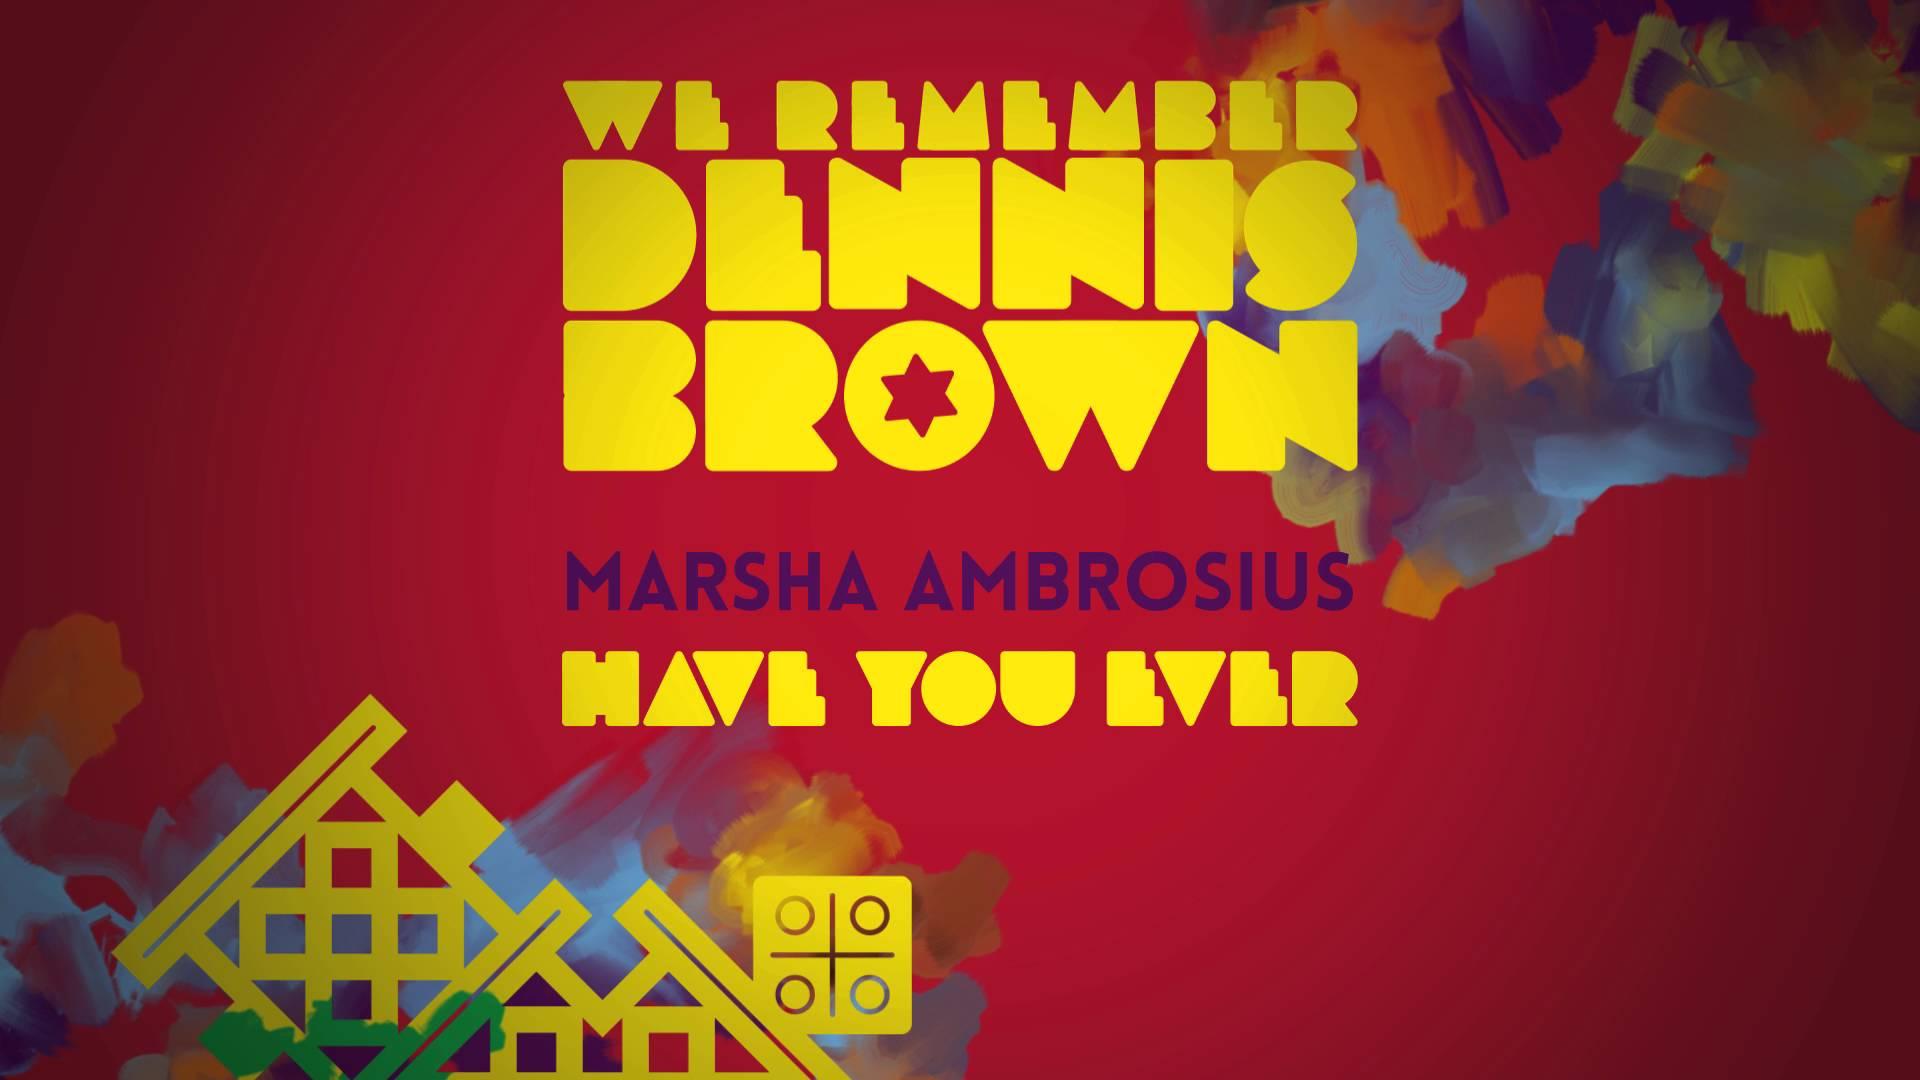 Marsha Ambrosius Have You Ever Dennis Brown